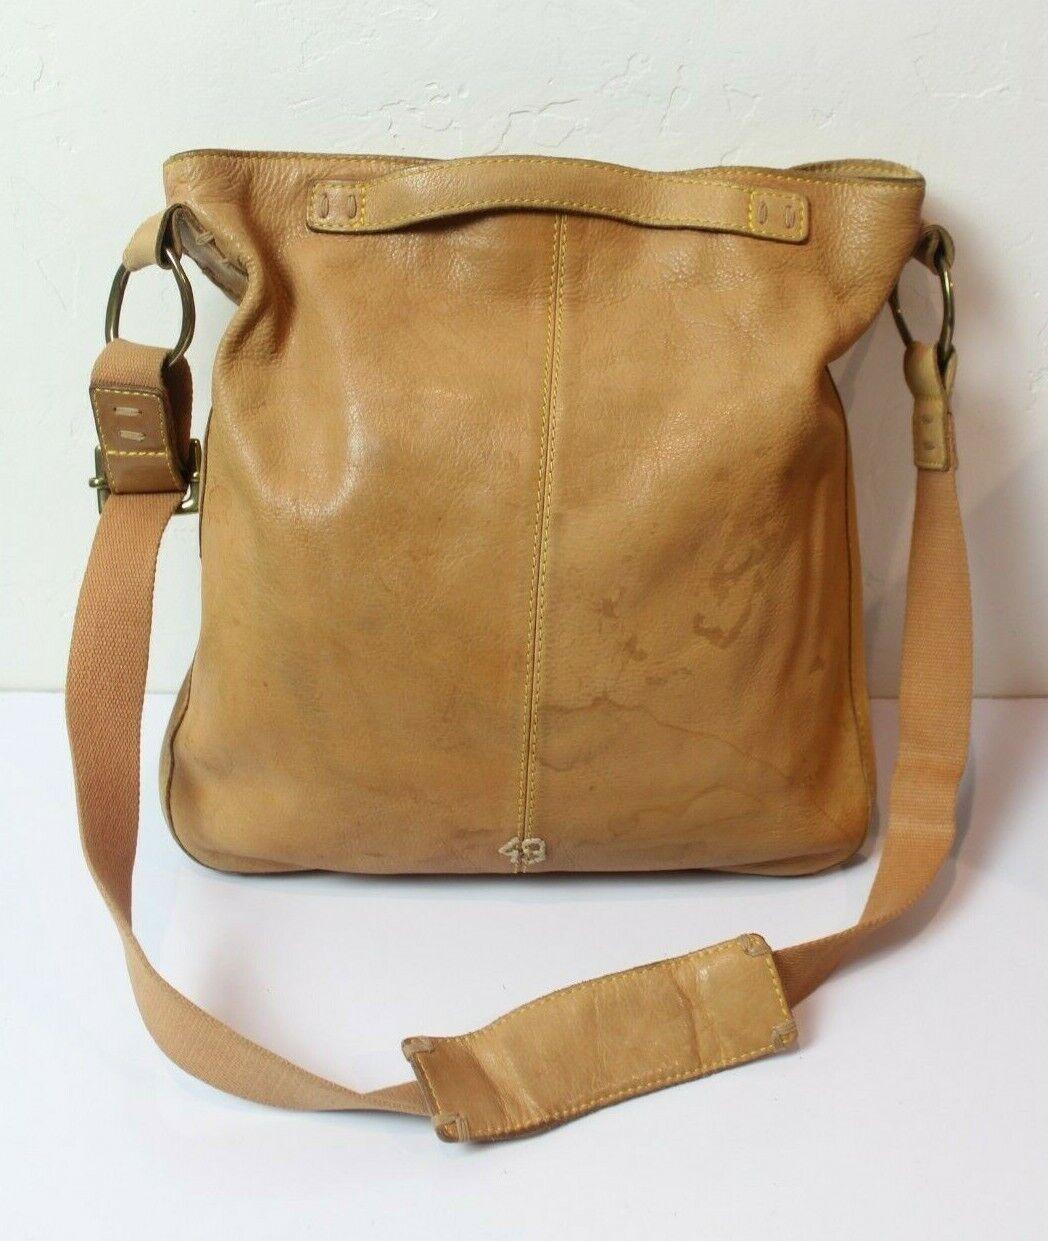 49 Square Miles Tan Leather Bag Hobo Large Bag - image 1